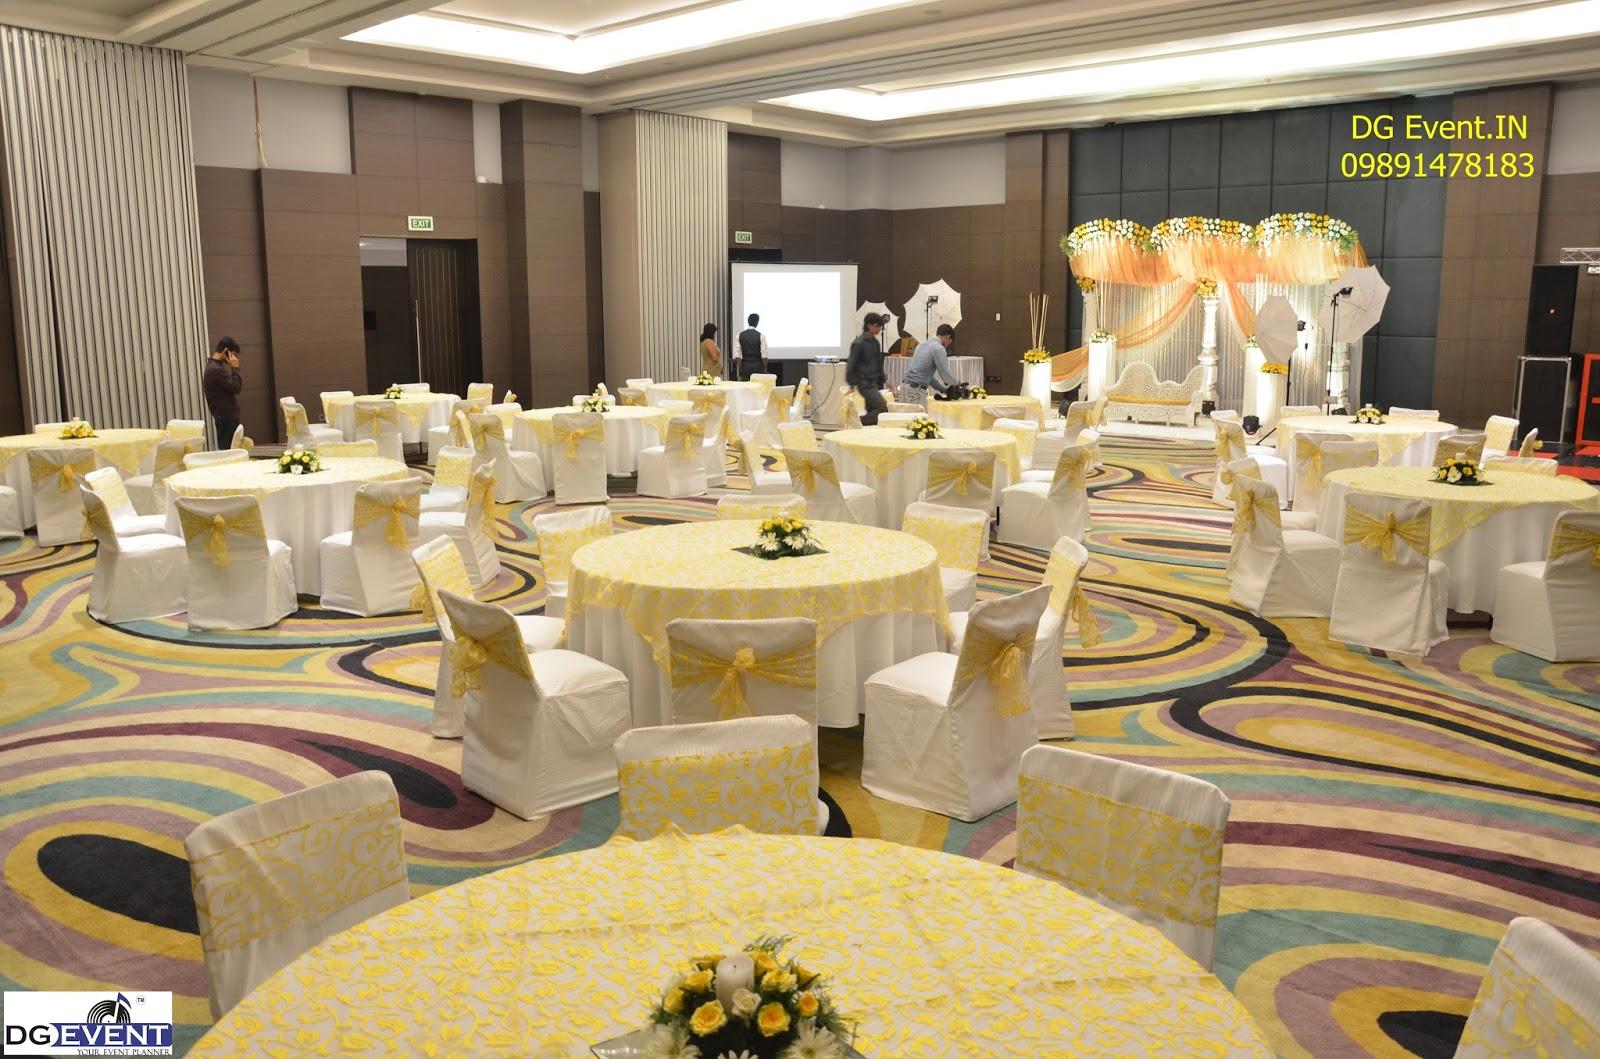 Wedding Ideas On A Budget 75 Best th wedding anniversary party